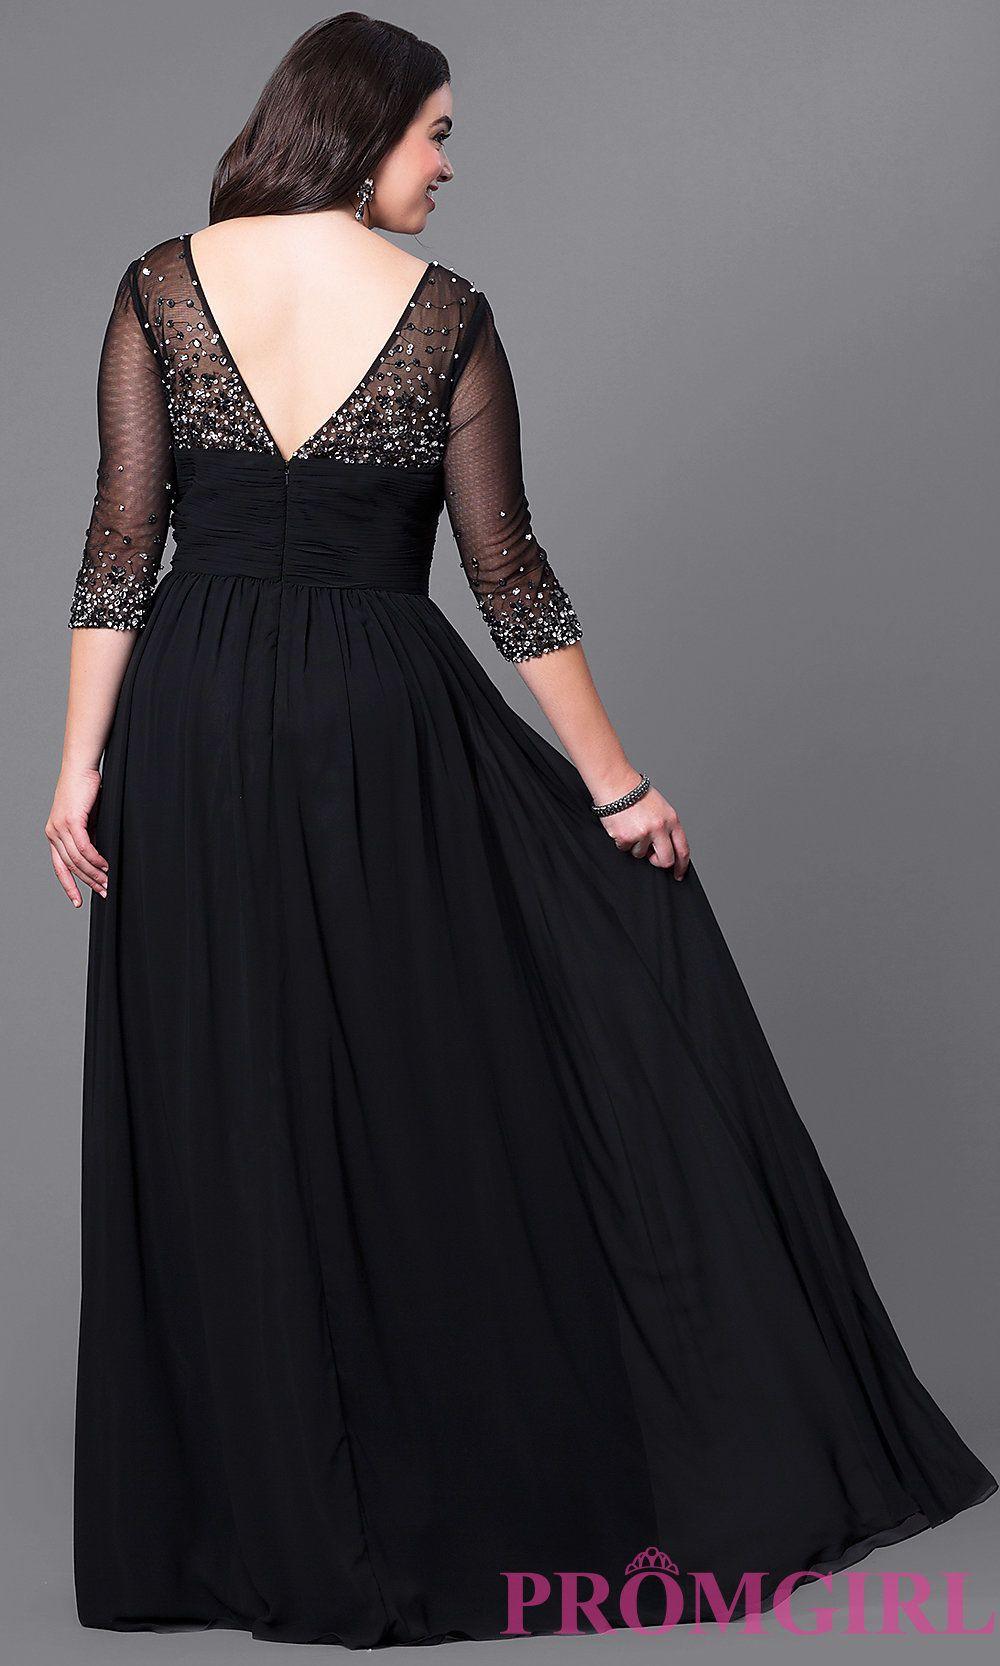 Style dqp back image fla pinterest long chiffon skirt